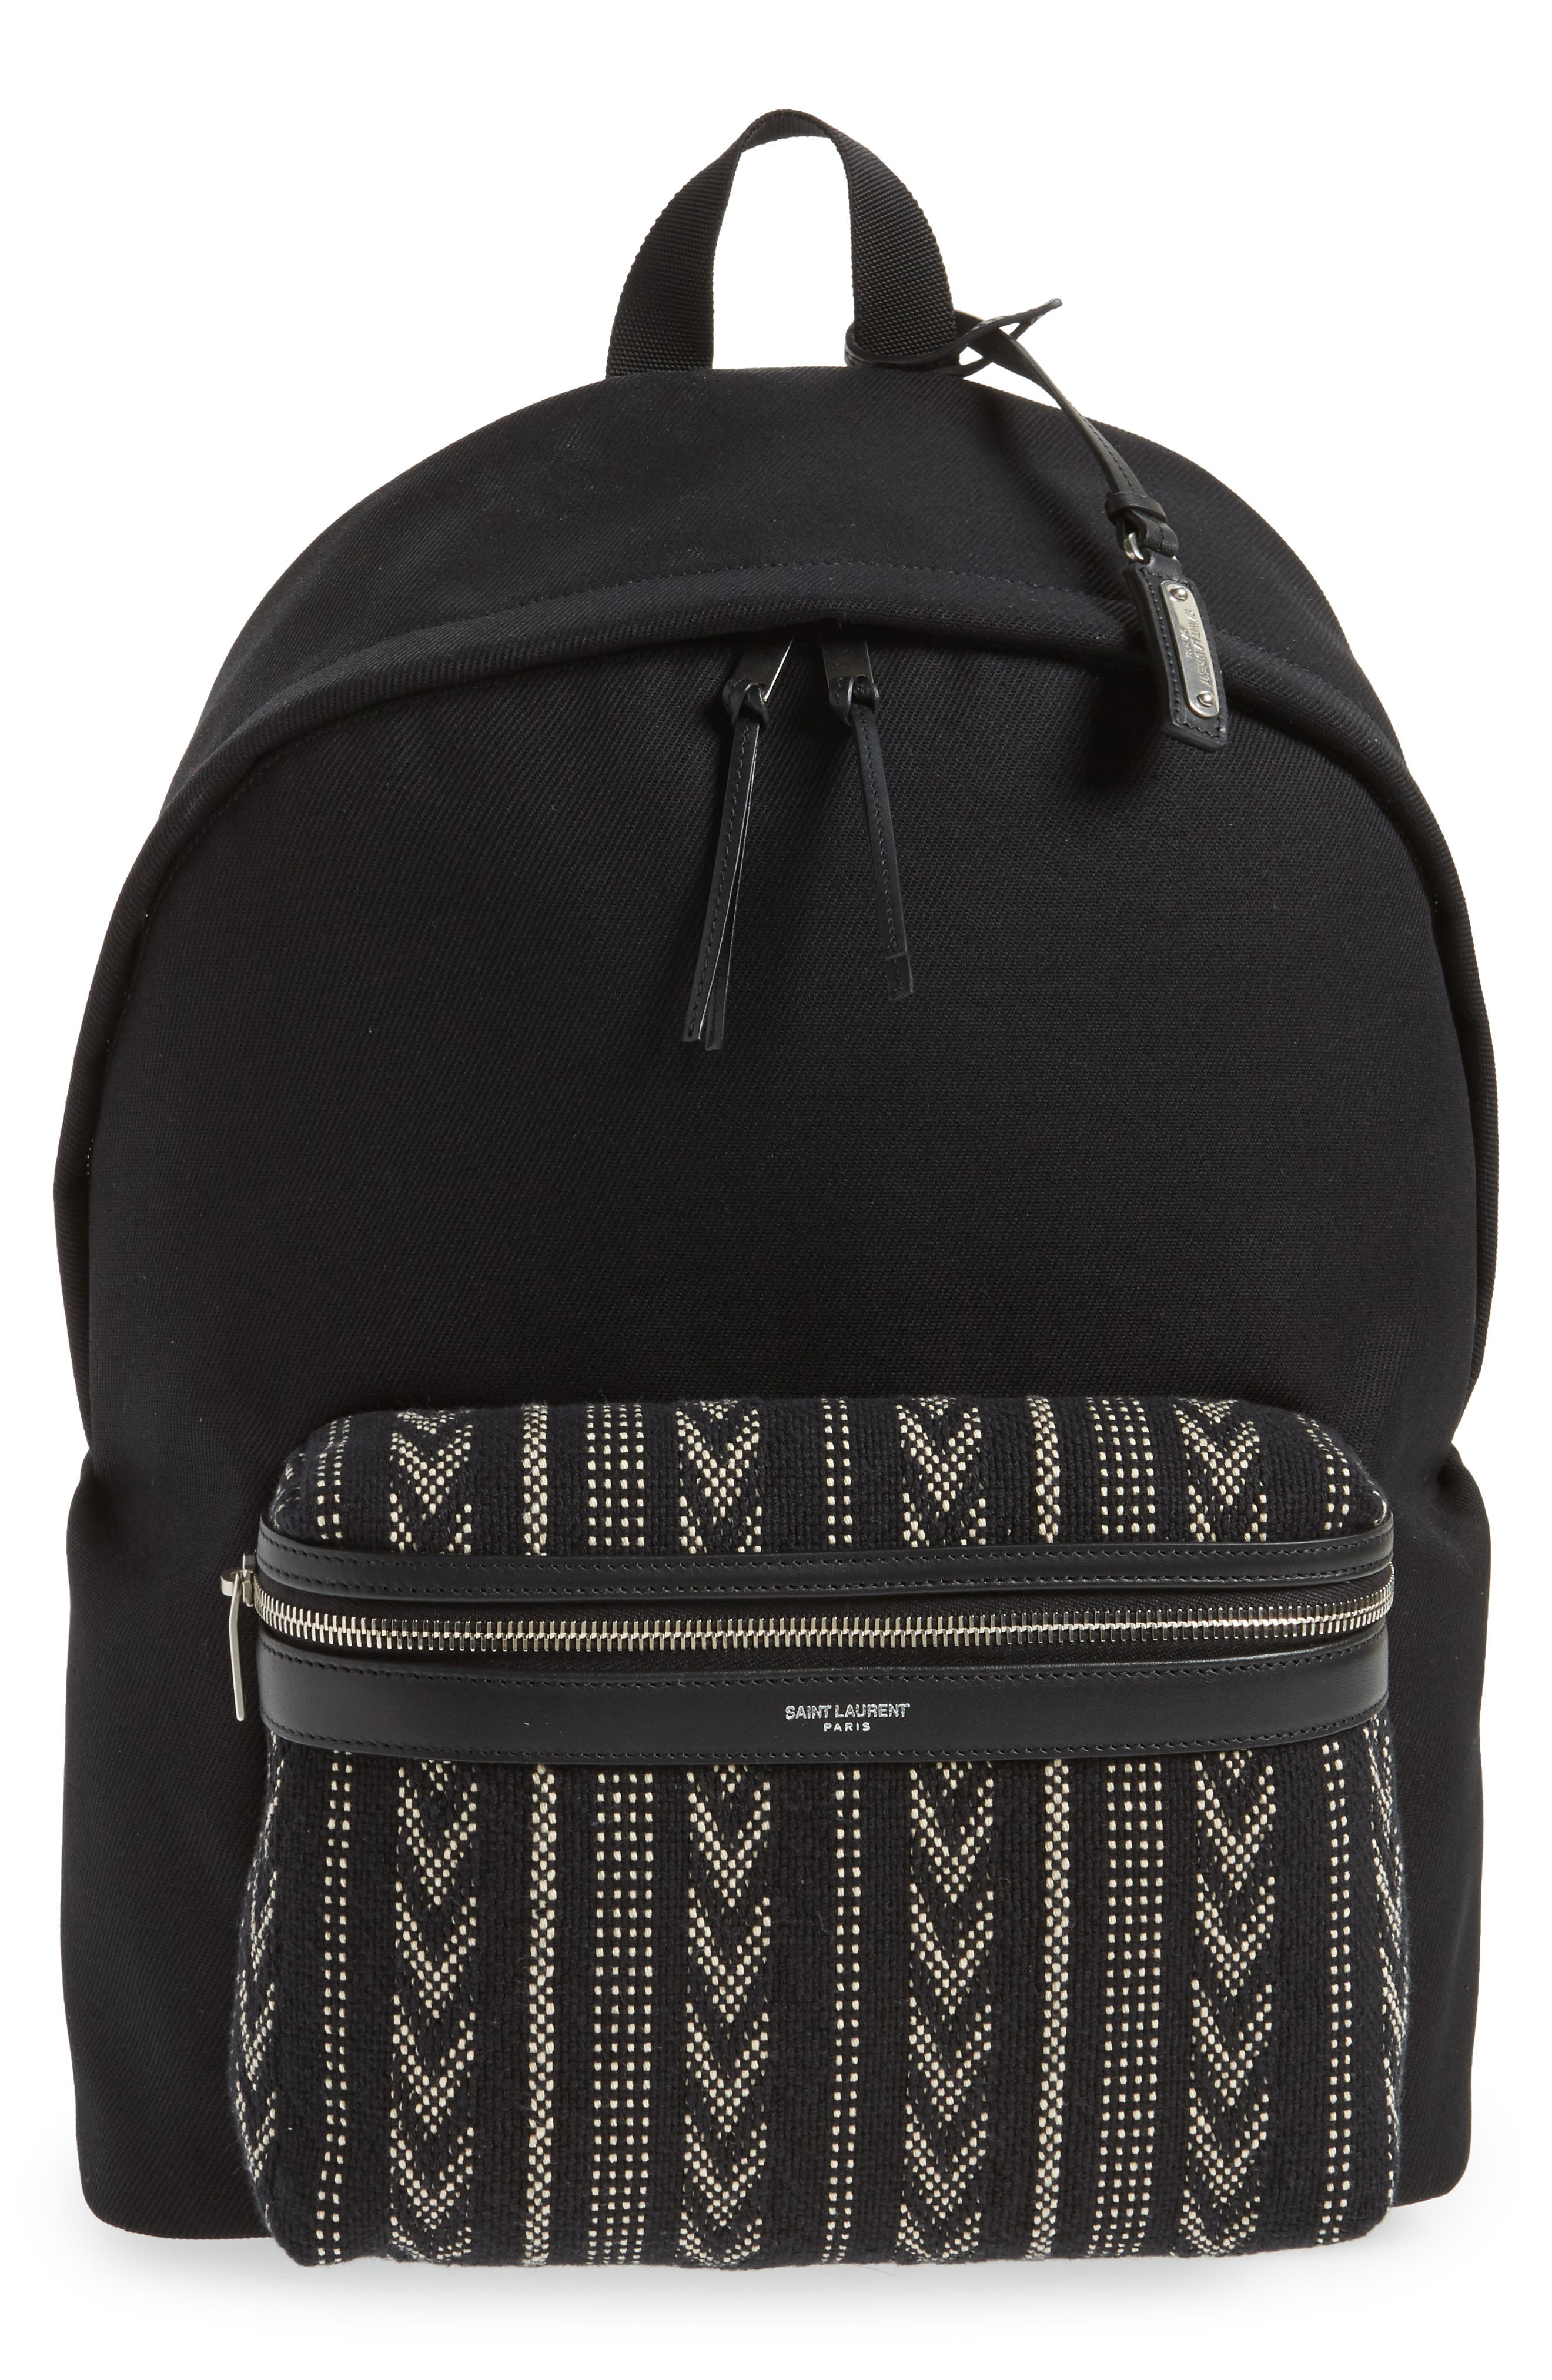 Pattern City Backpack,                             Main thumbnail 1, color,                             Black/ White